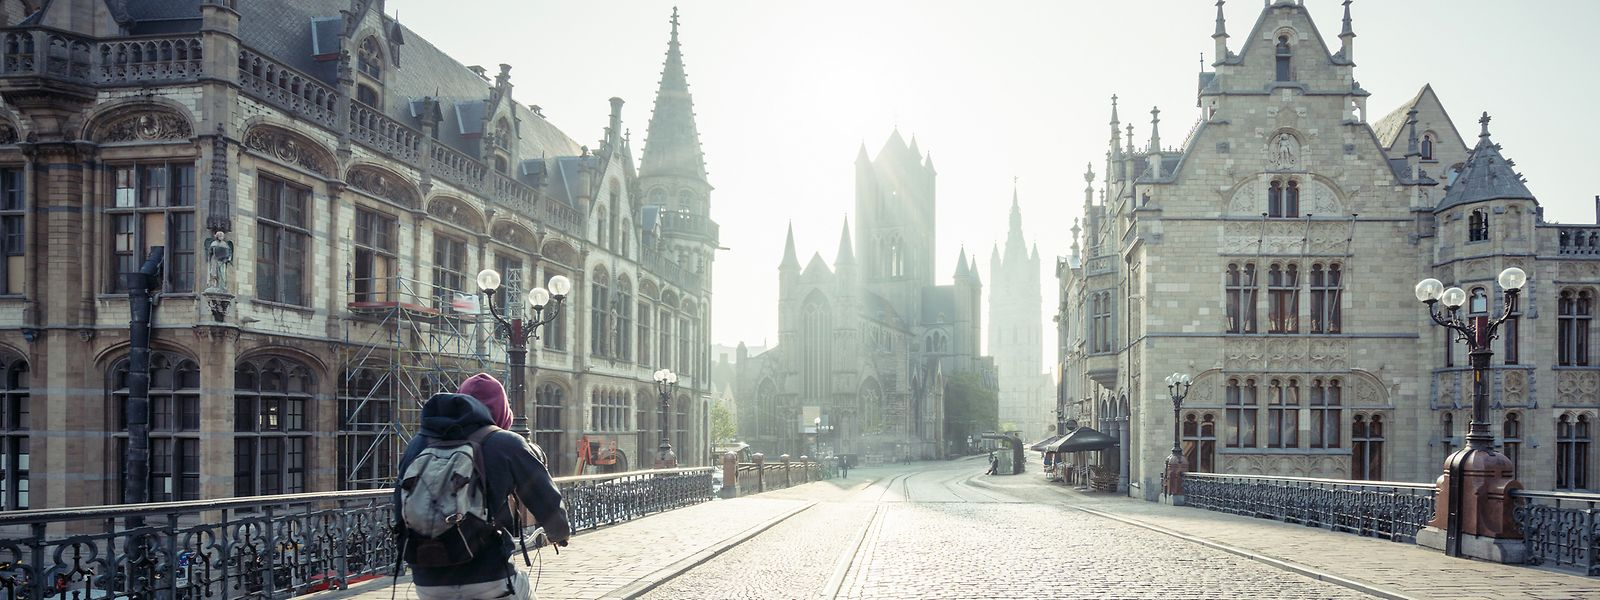 Mit dem Fahrrad durch die Kulturmetropole Gent.